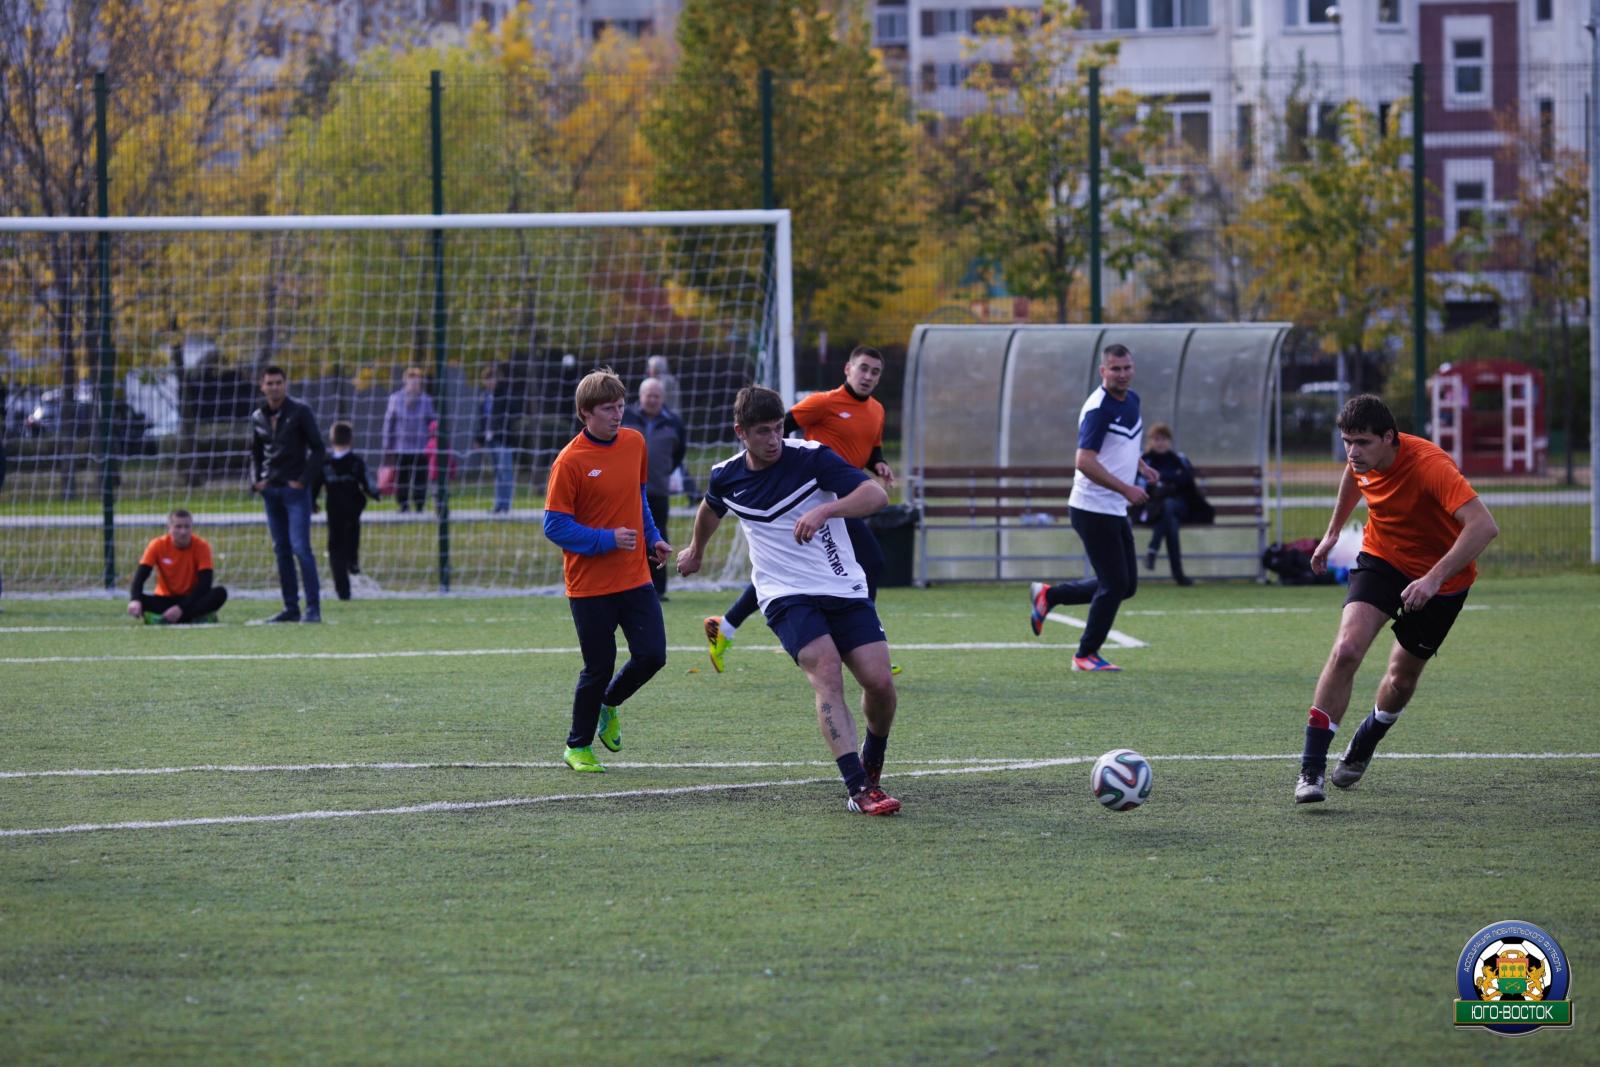 2 ой дивизион по футболу таблица россия